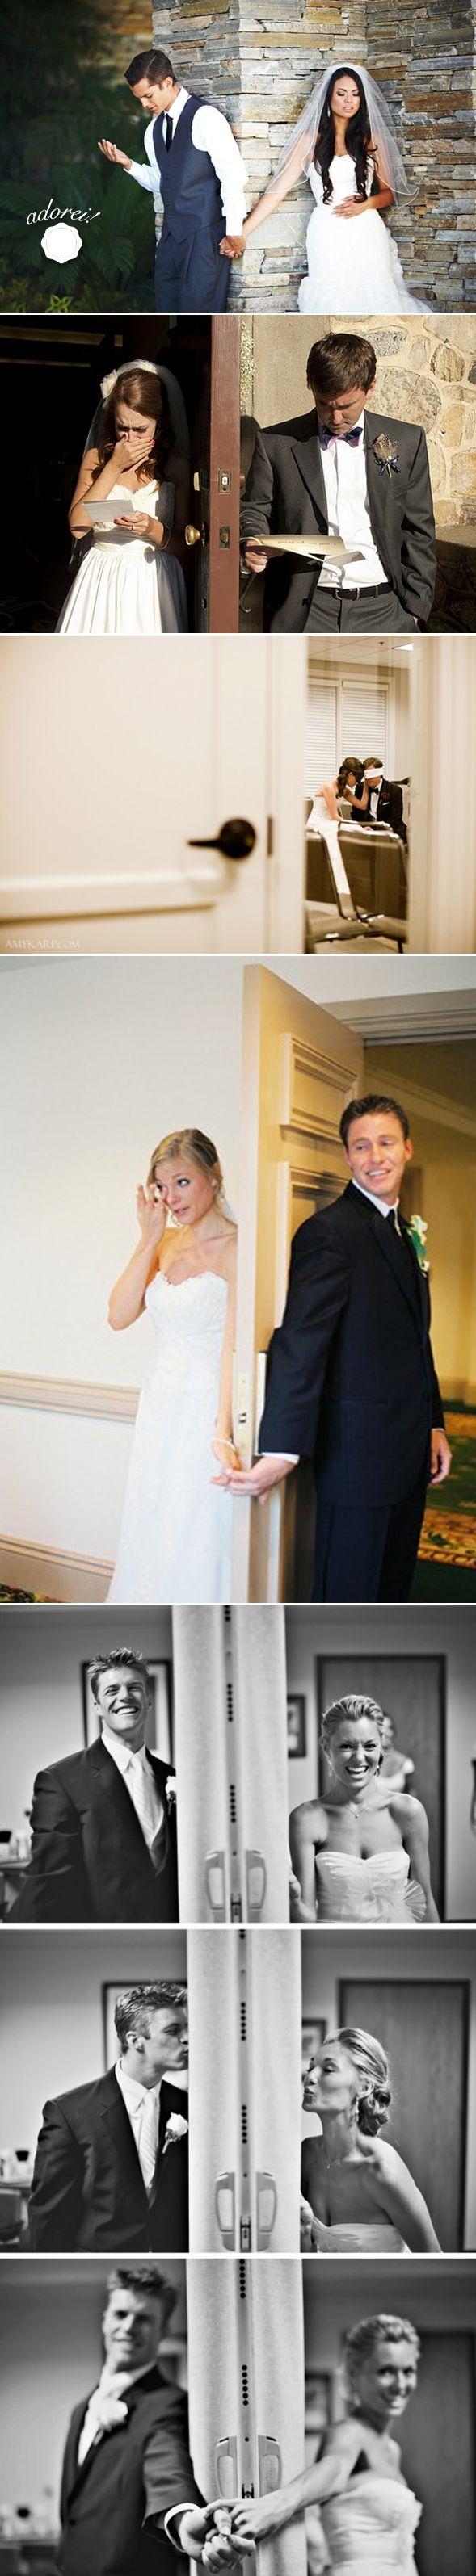 best Wedding planning  images on Pinterest  Wedding